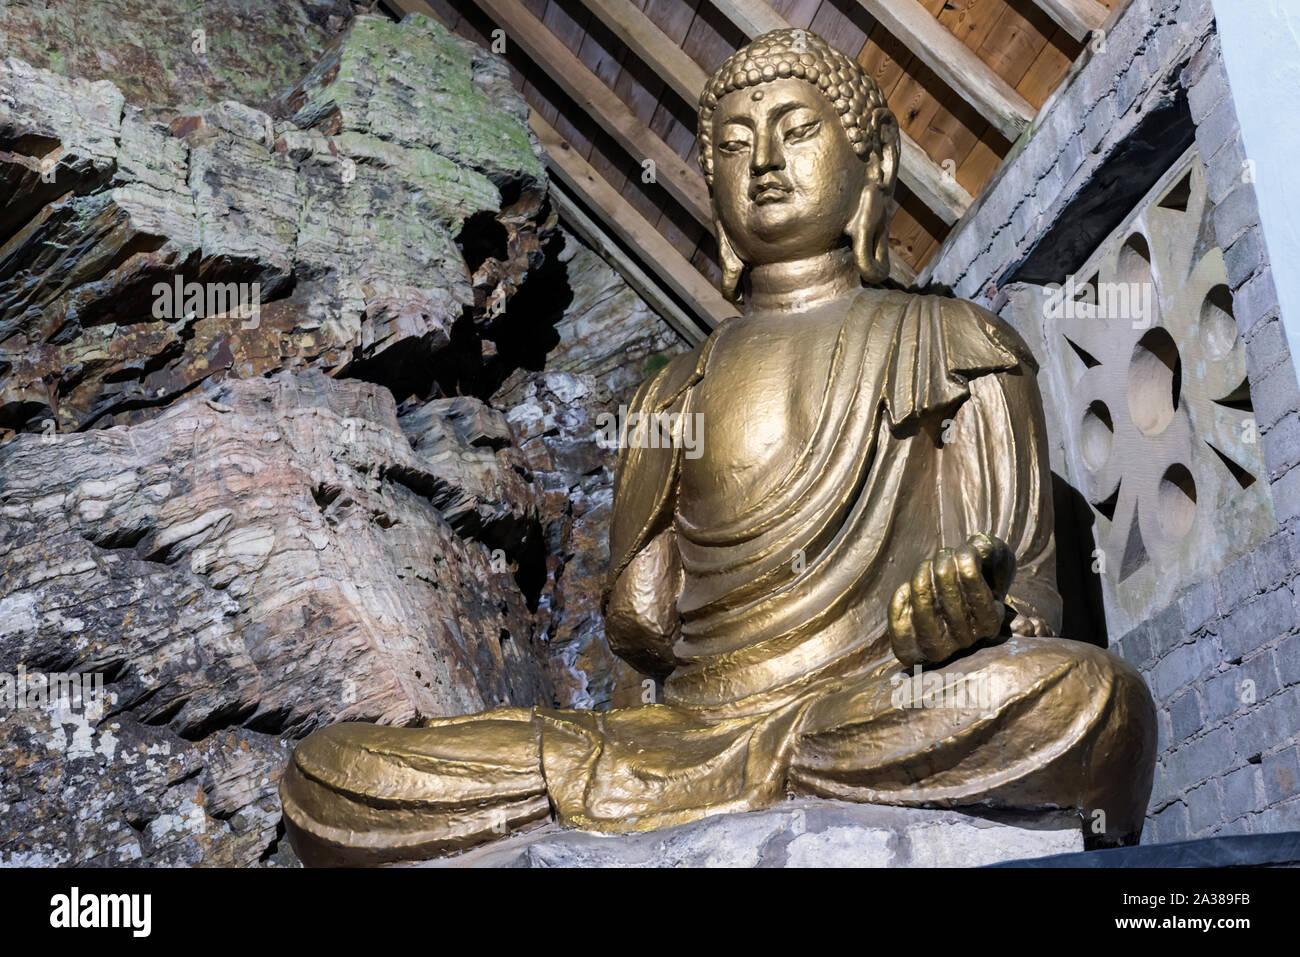 Golden Buddha statue at Portmeirion Village Stock Photo